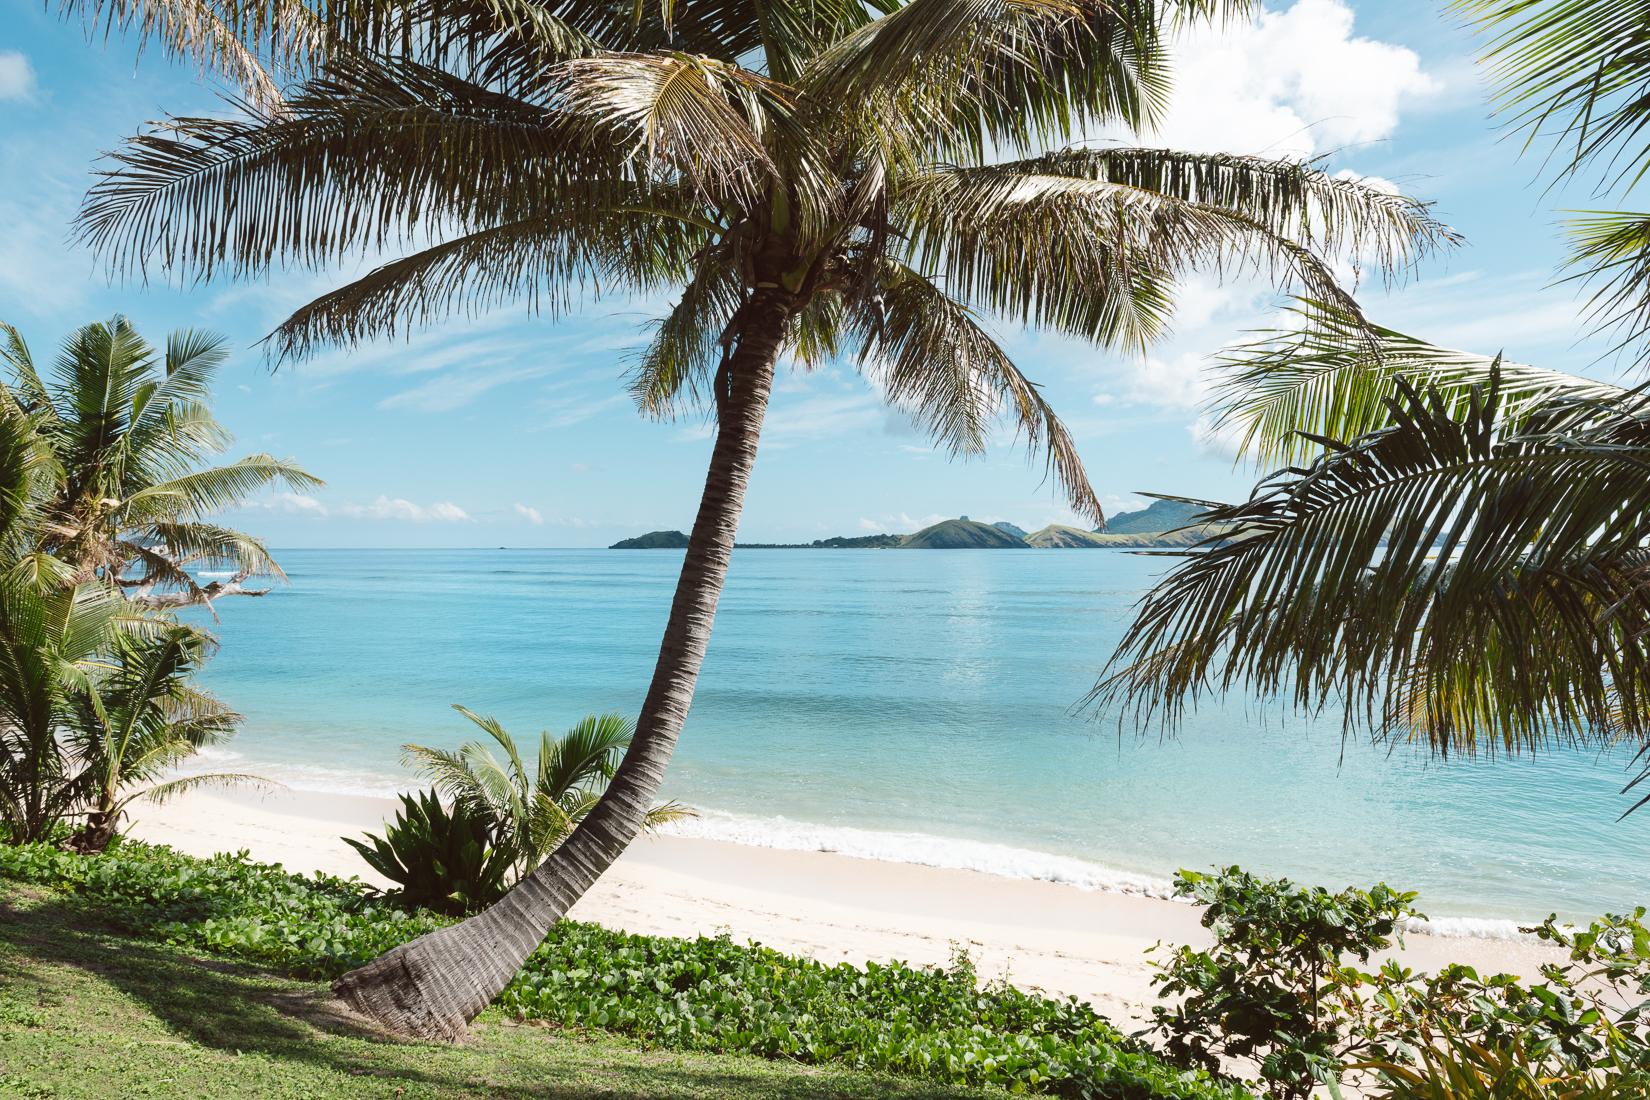 Islandtime Magazine Tokoriki Island Resort